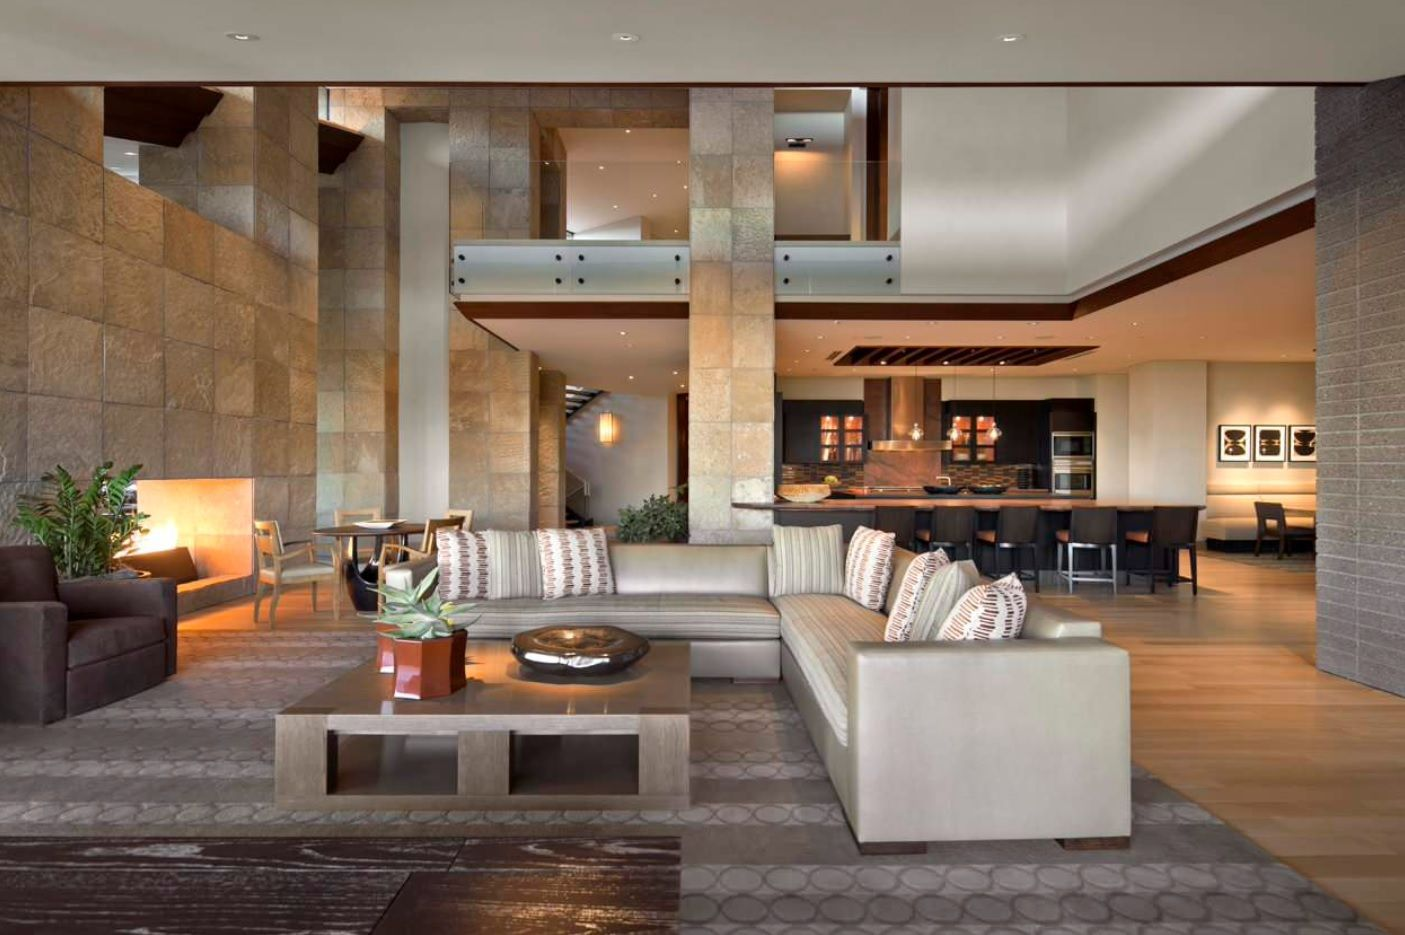 15+ Living Room Lounge Decoration Photos - Small Design Ideas